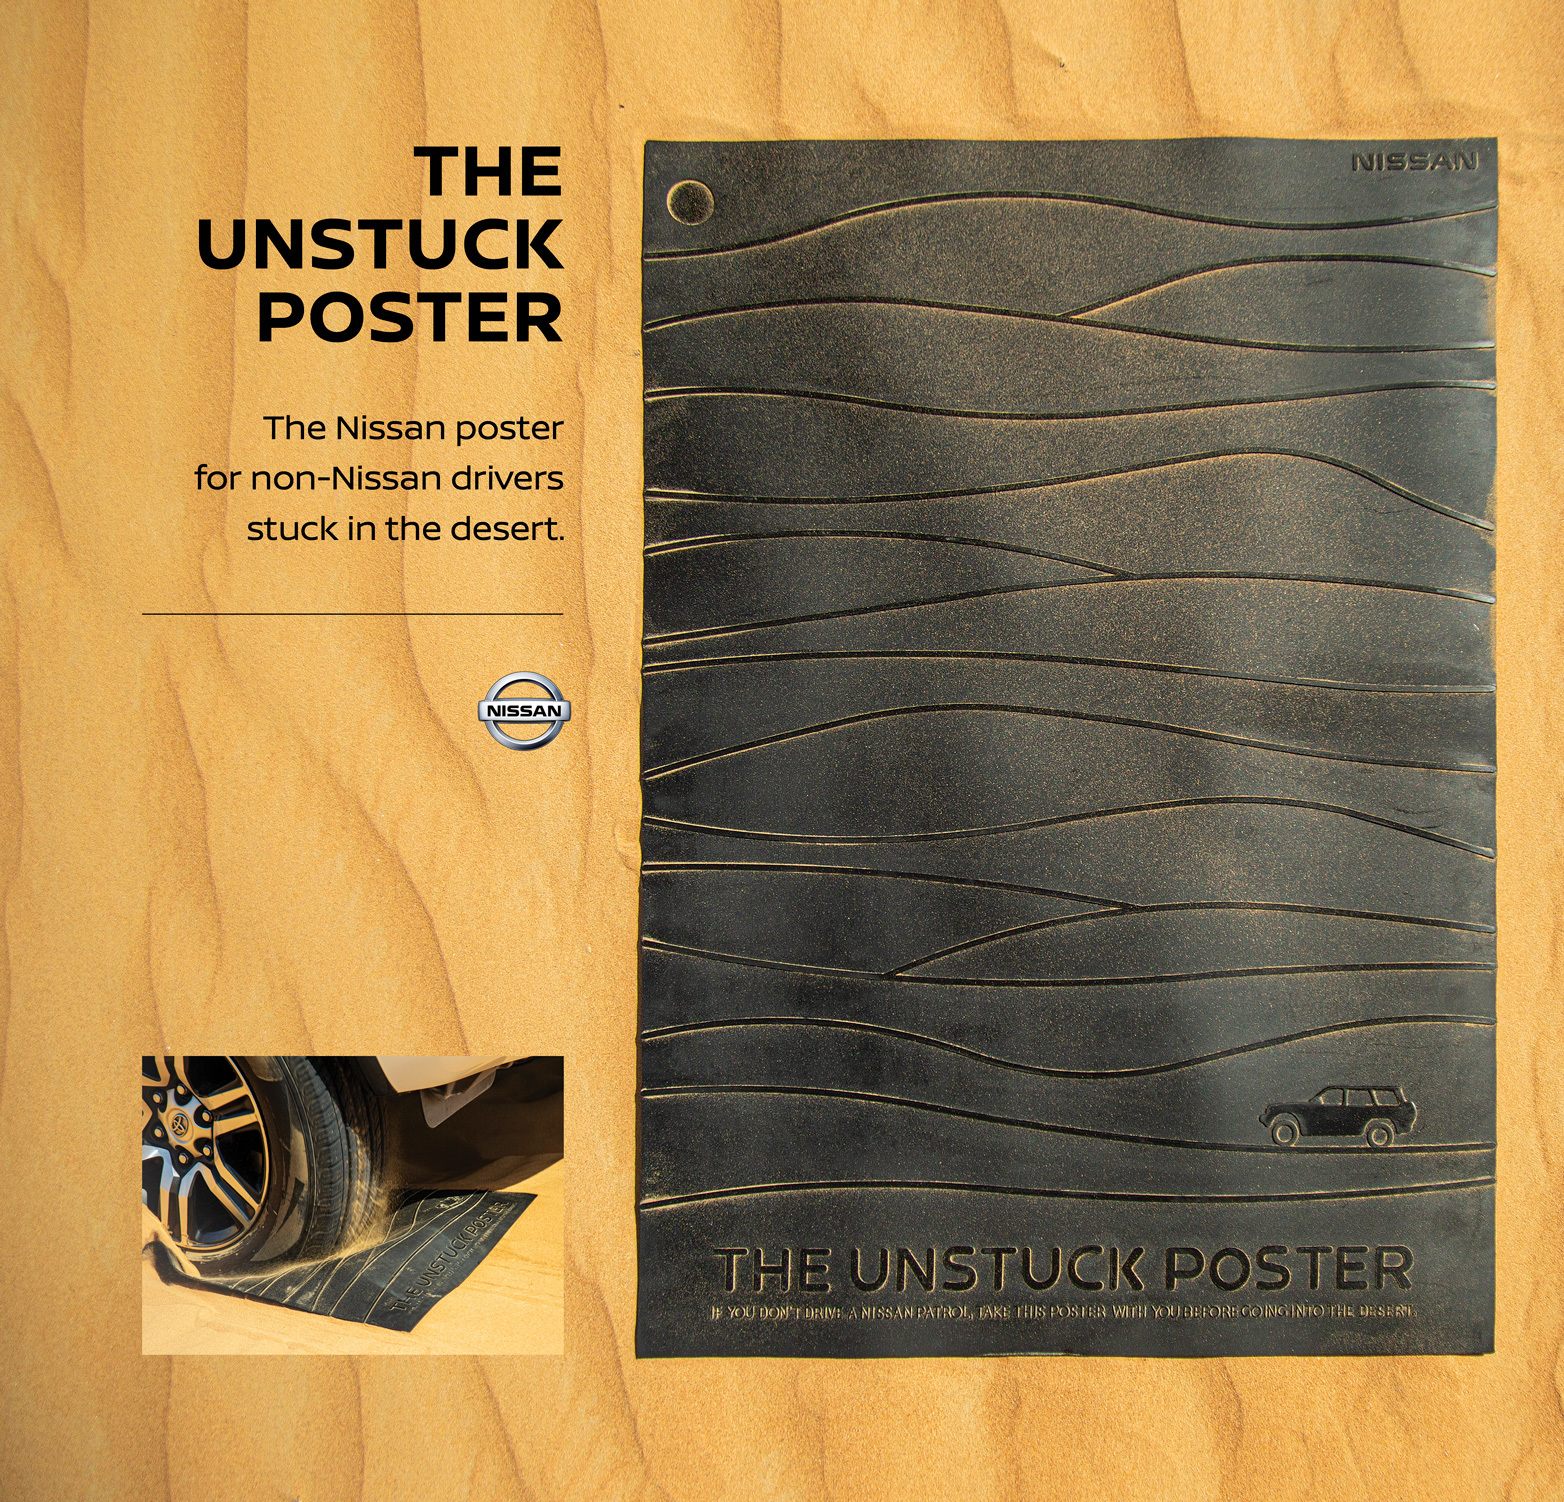 Nissan Unstuck Poster